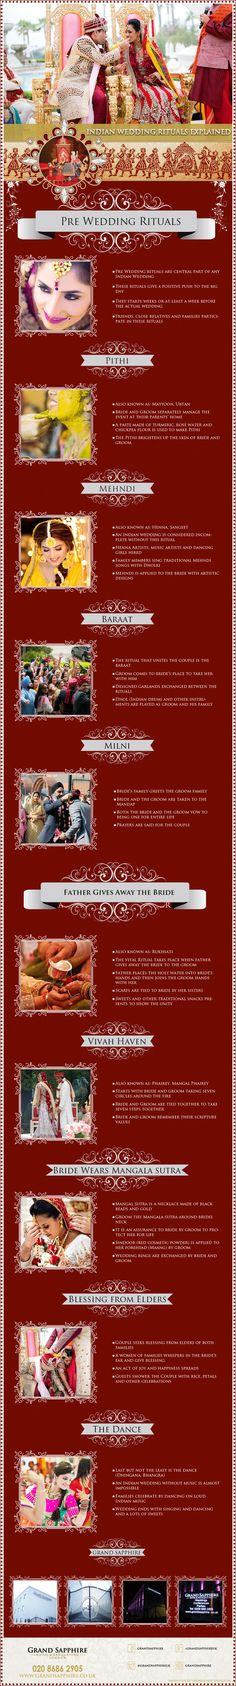 Wedding Dresses Indian Bridal Muslim 42 Ideas For 2019 Asian Wedding Venues, Asian Wedding Dress, Wedding Arch Rustic, Wedding Dresses, Gifts For Wedding Party, Wedding Tips, Wedding Themes, Wedding Events, Wedding Decor